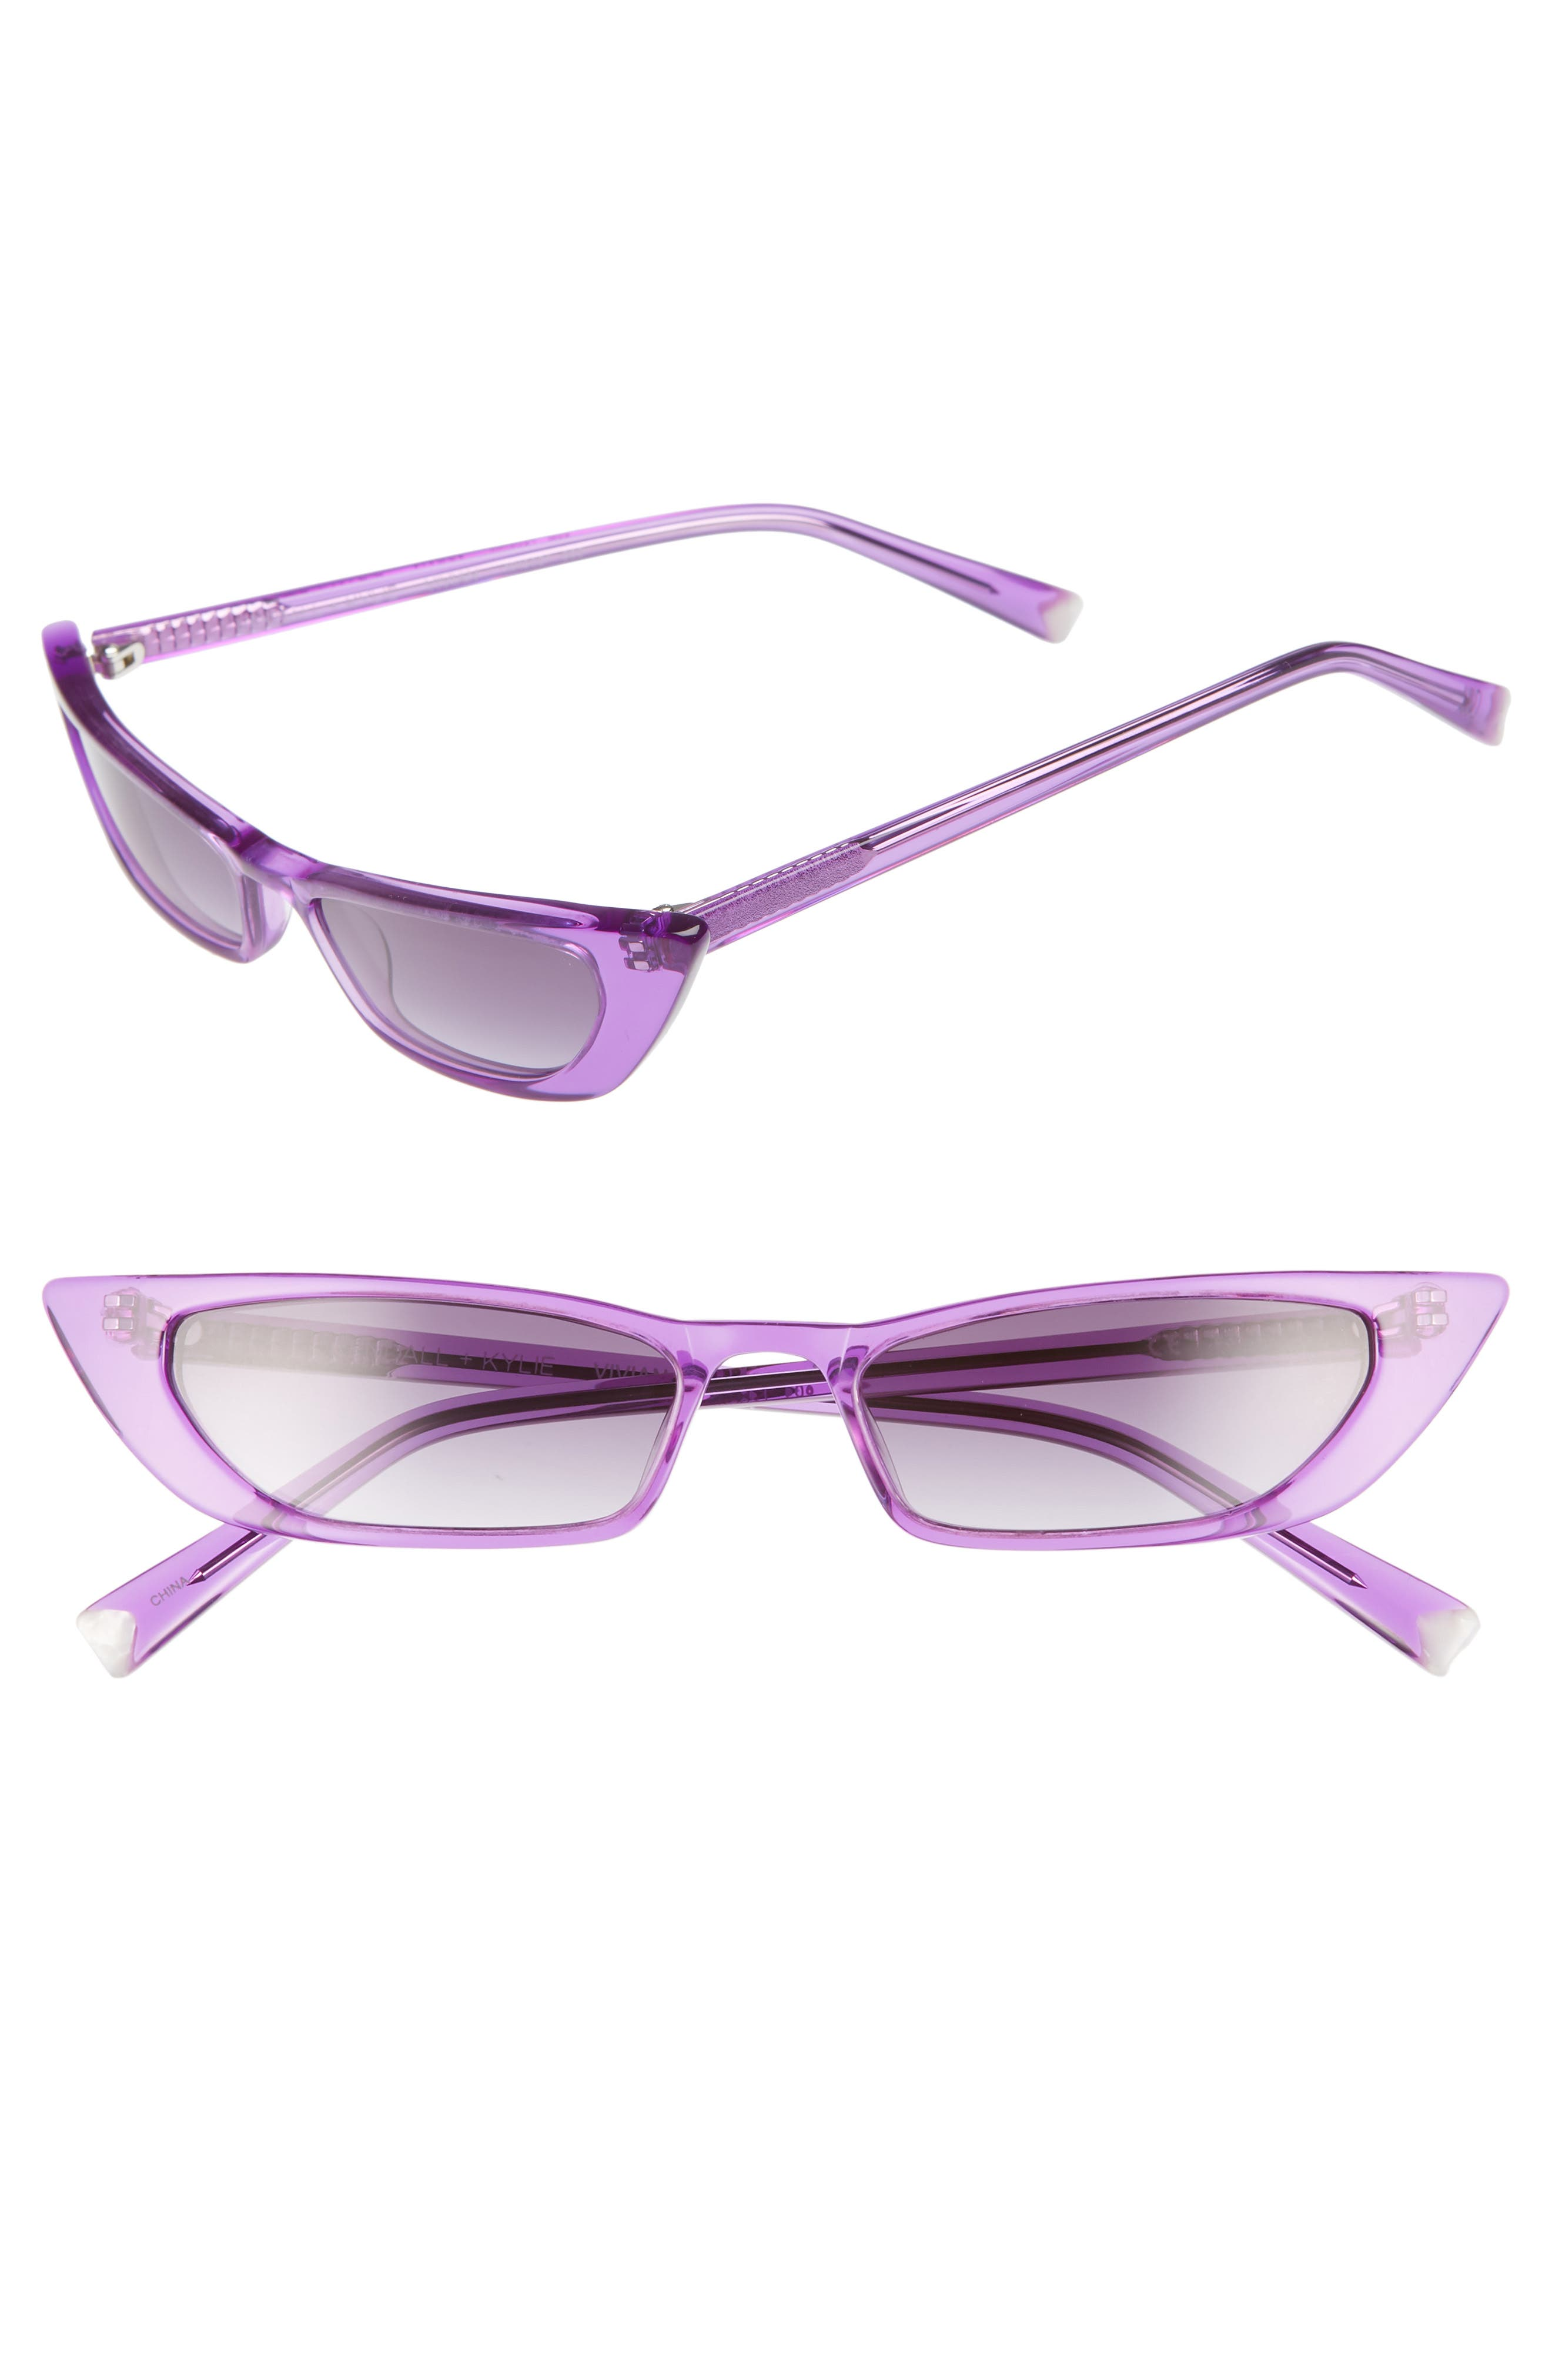 Kendall + Kylie Vivian 51Mm Extreme Cat Eye Sunglasses - Crystal Purple